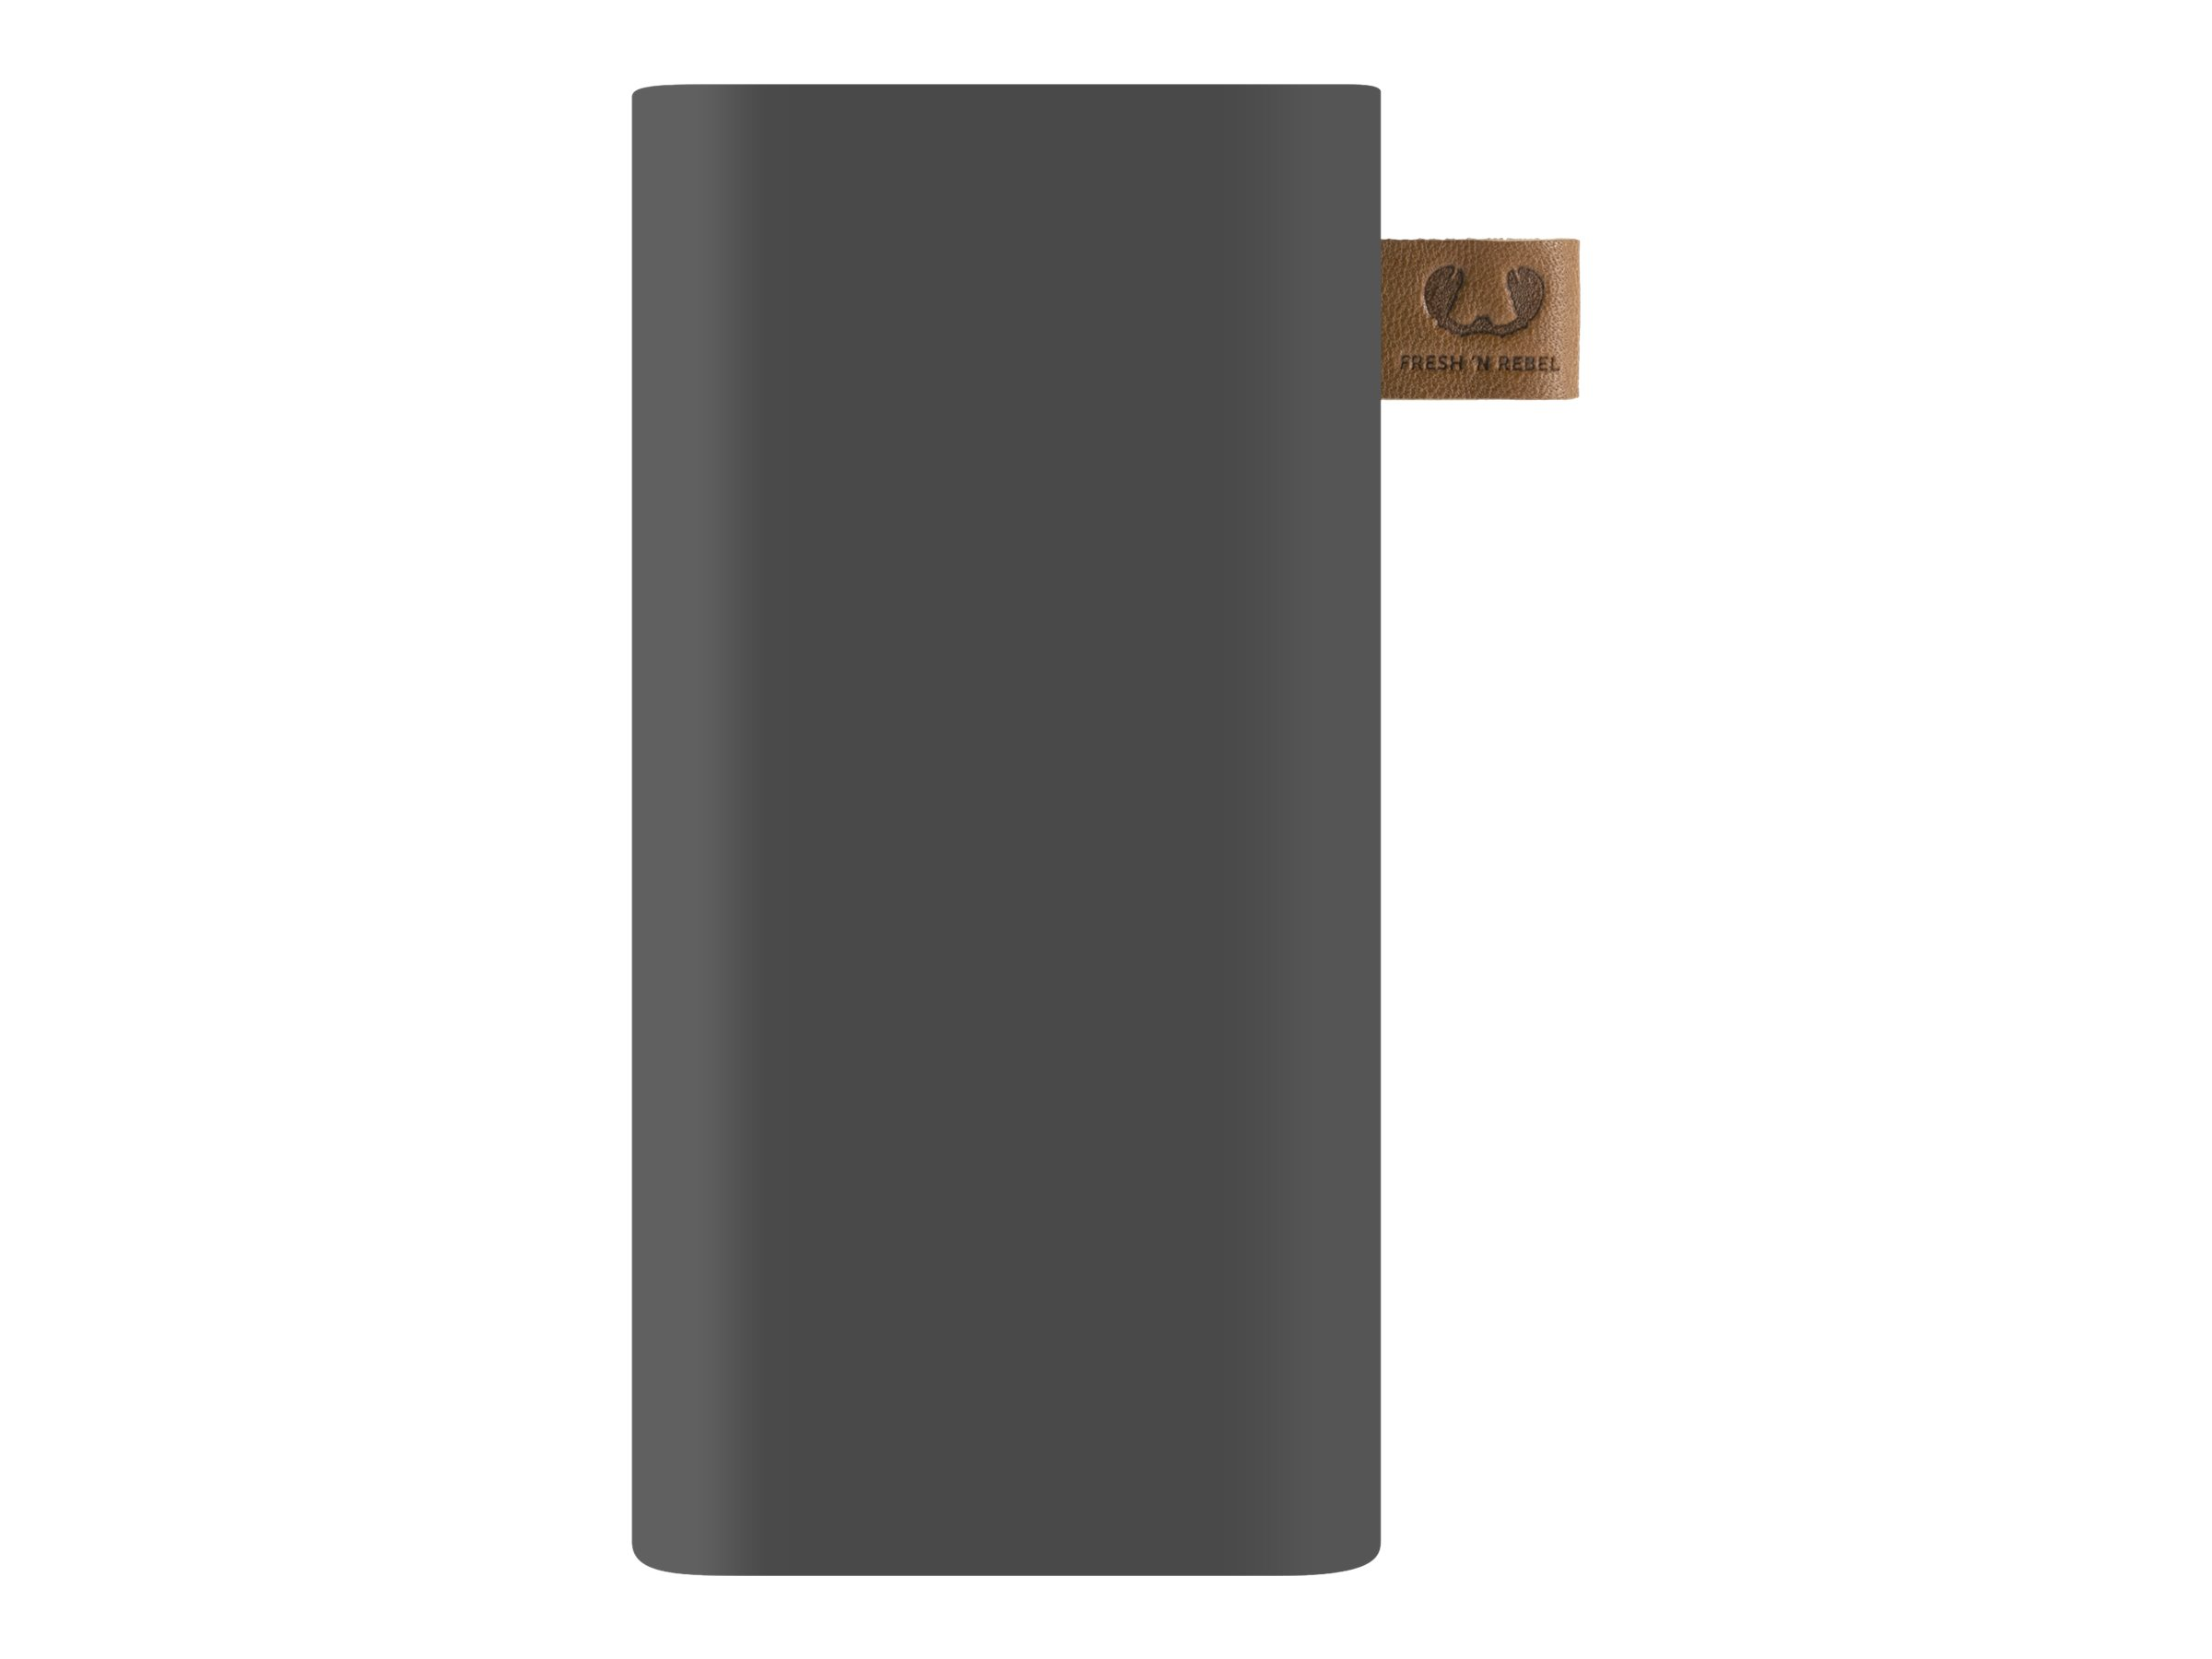 Fresh 'n Rebel Powerbank - Powerbank - 6000 mAh - 2.1 A - 2 Ausgabeanschlussstellen (USB, USB-C) - auf Kabel: USB-C